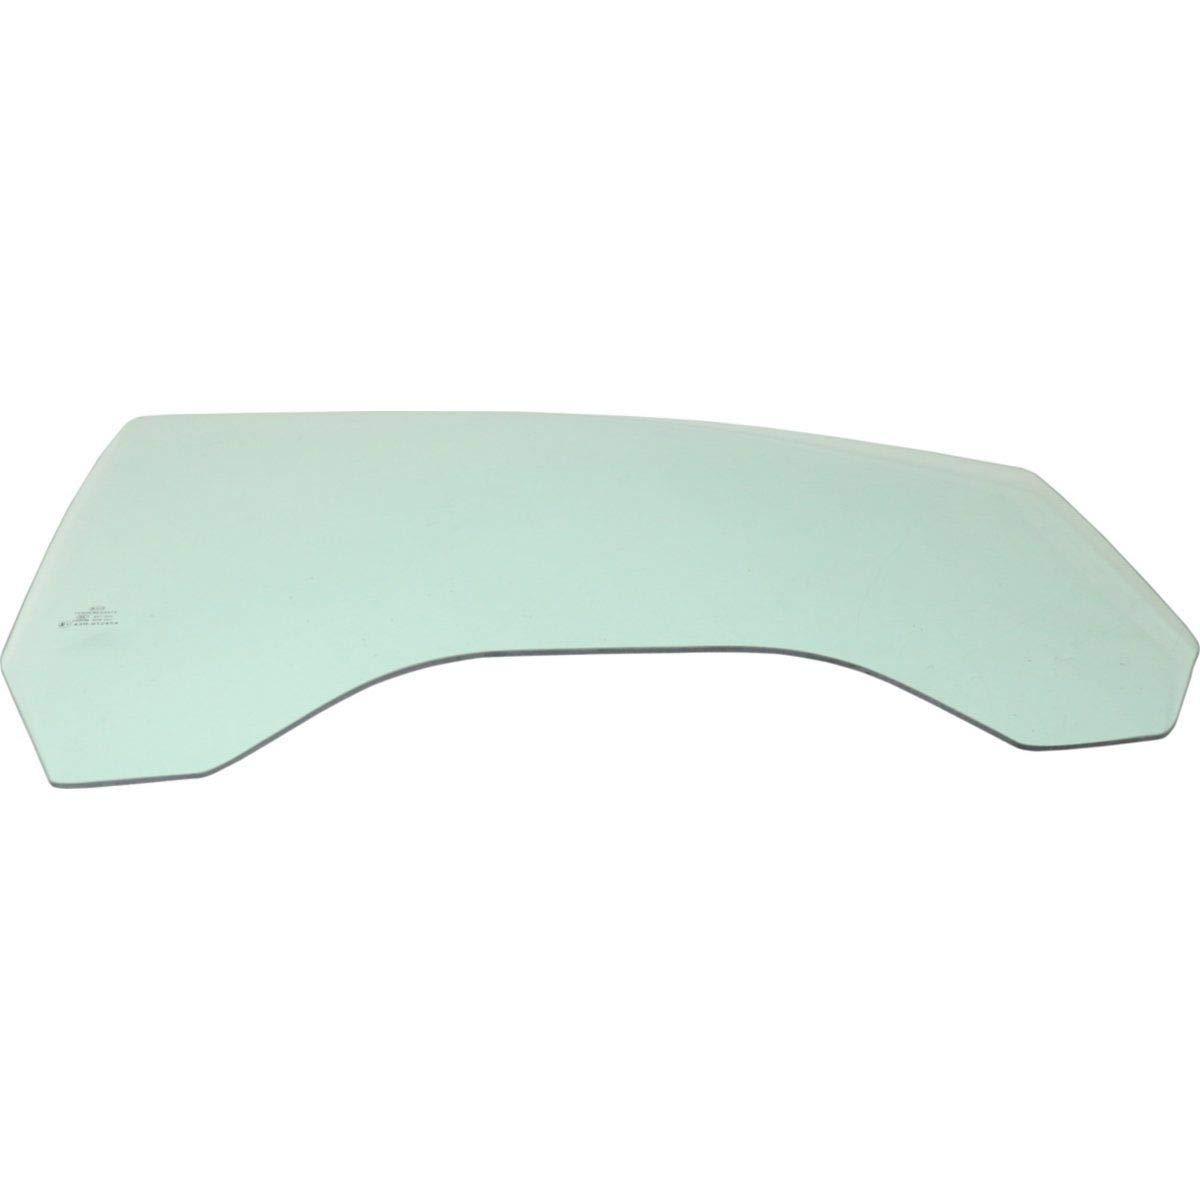 New Door Glass Front Passenger Right Side Chevy RH Hand Silverado 1500 20979115